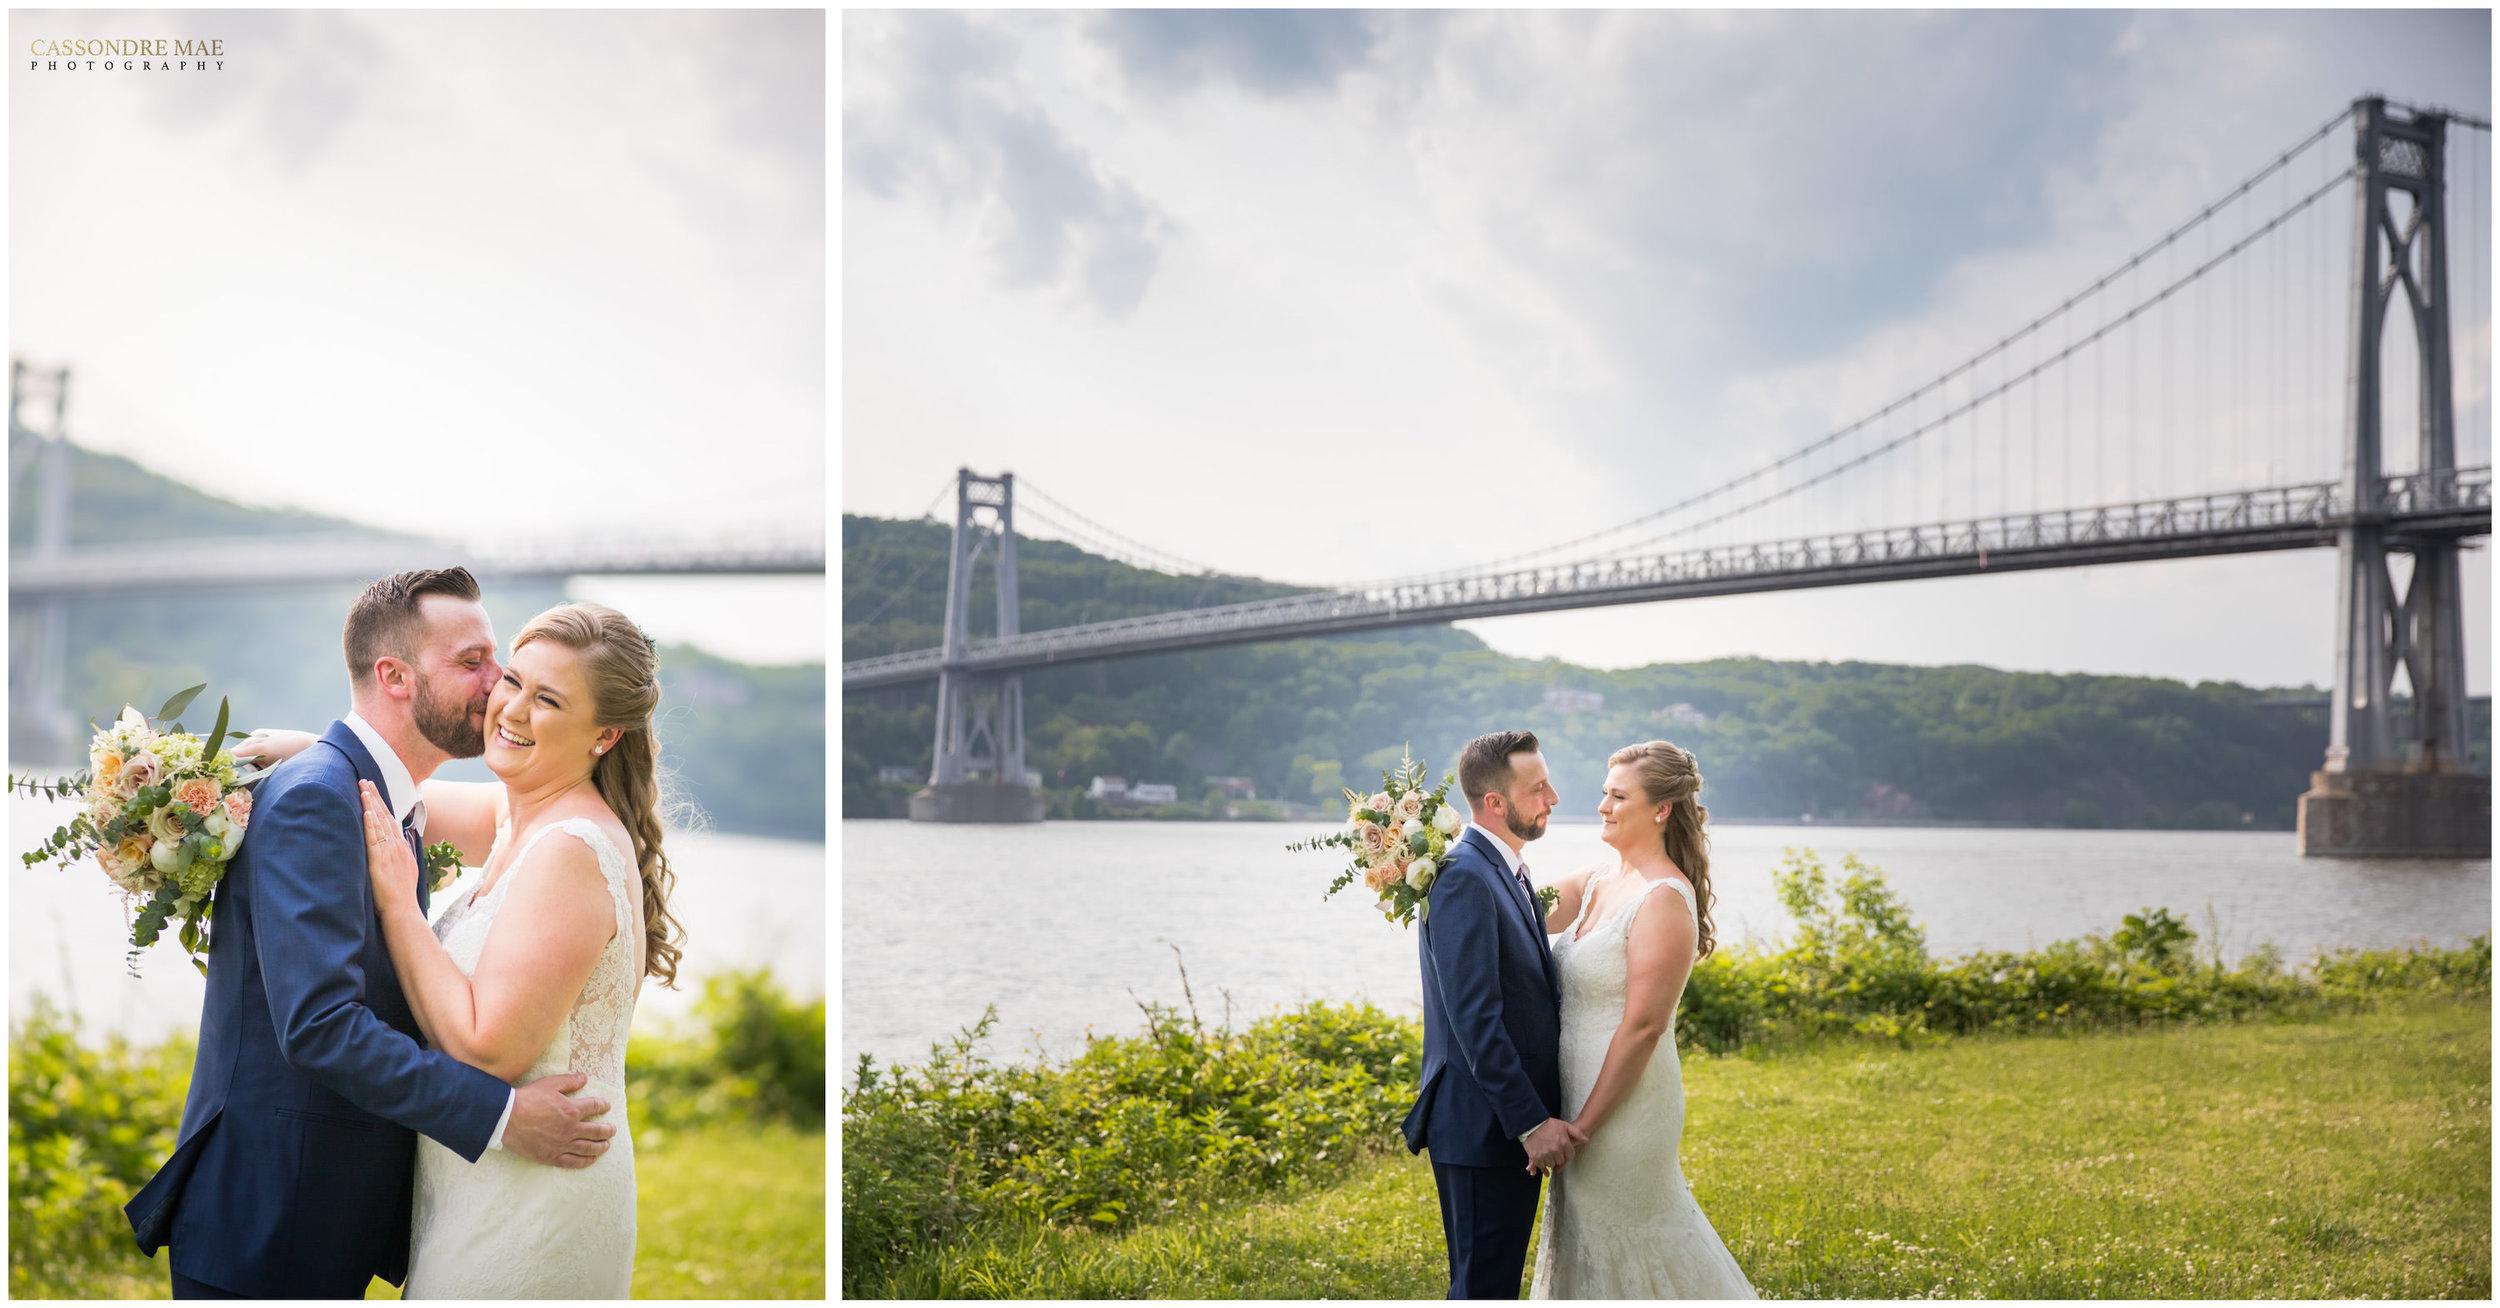 Cassondre Mae Photography Grandview Wedding Photos Poughkeepsie NY Hudson Valley 20.jpg